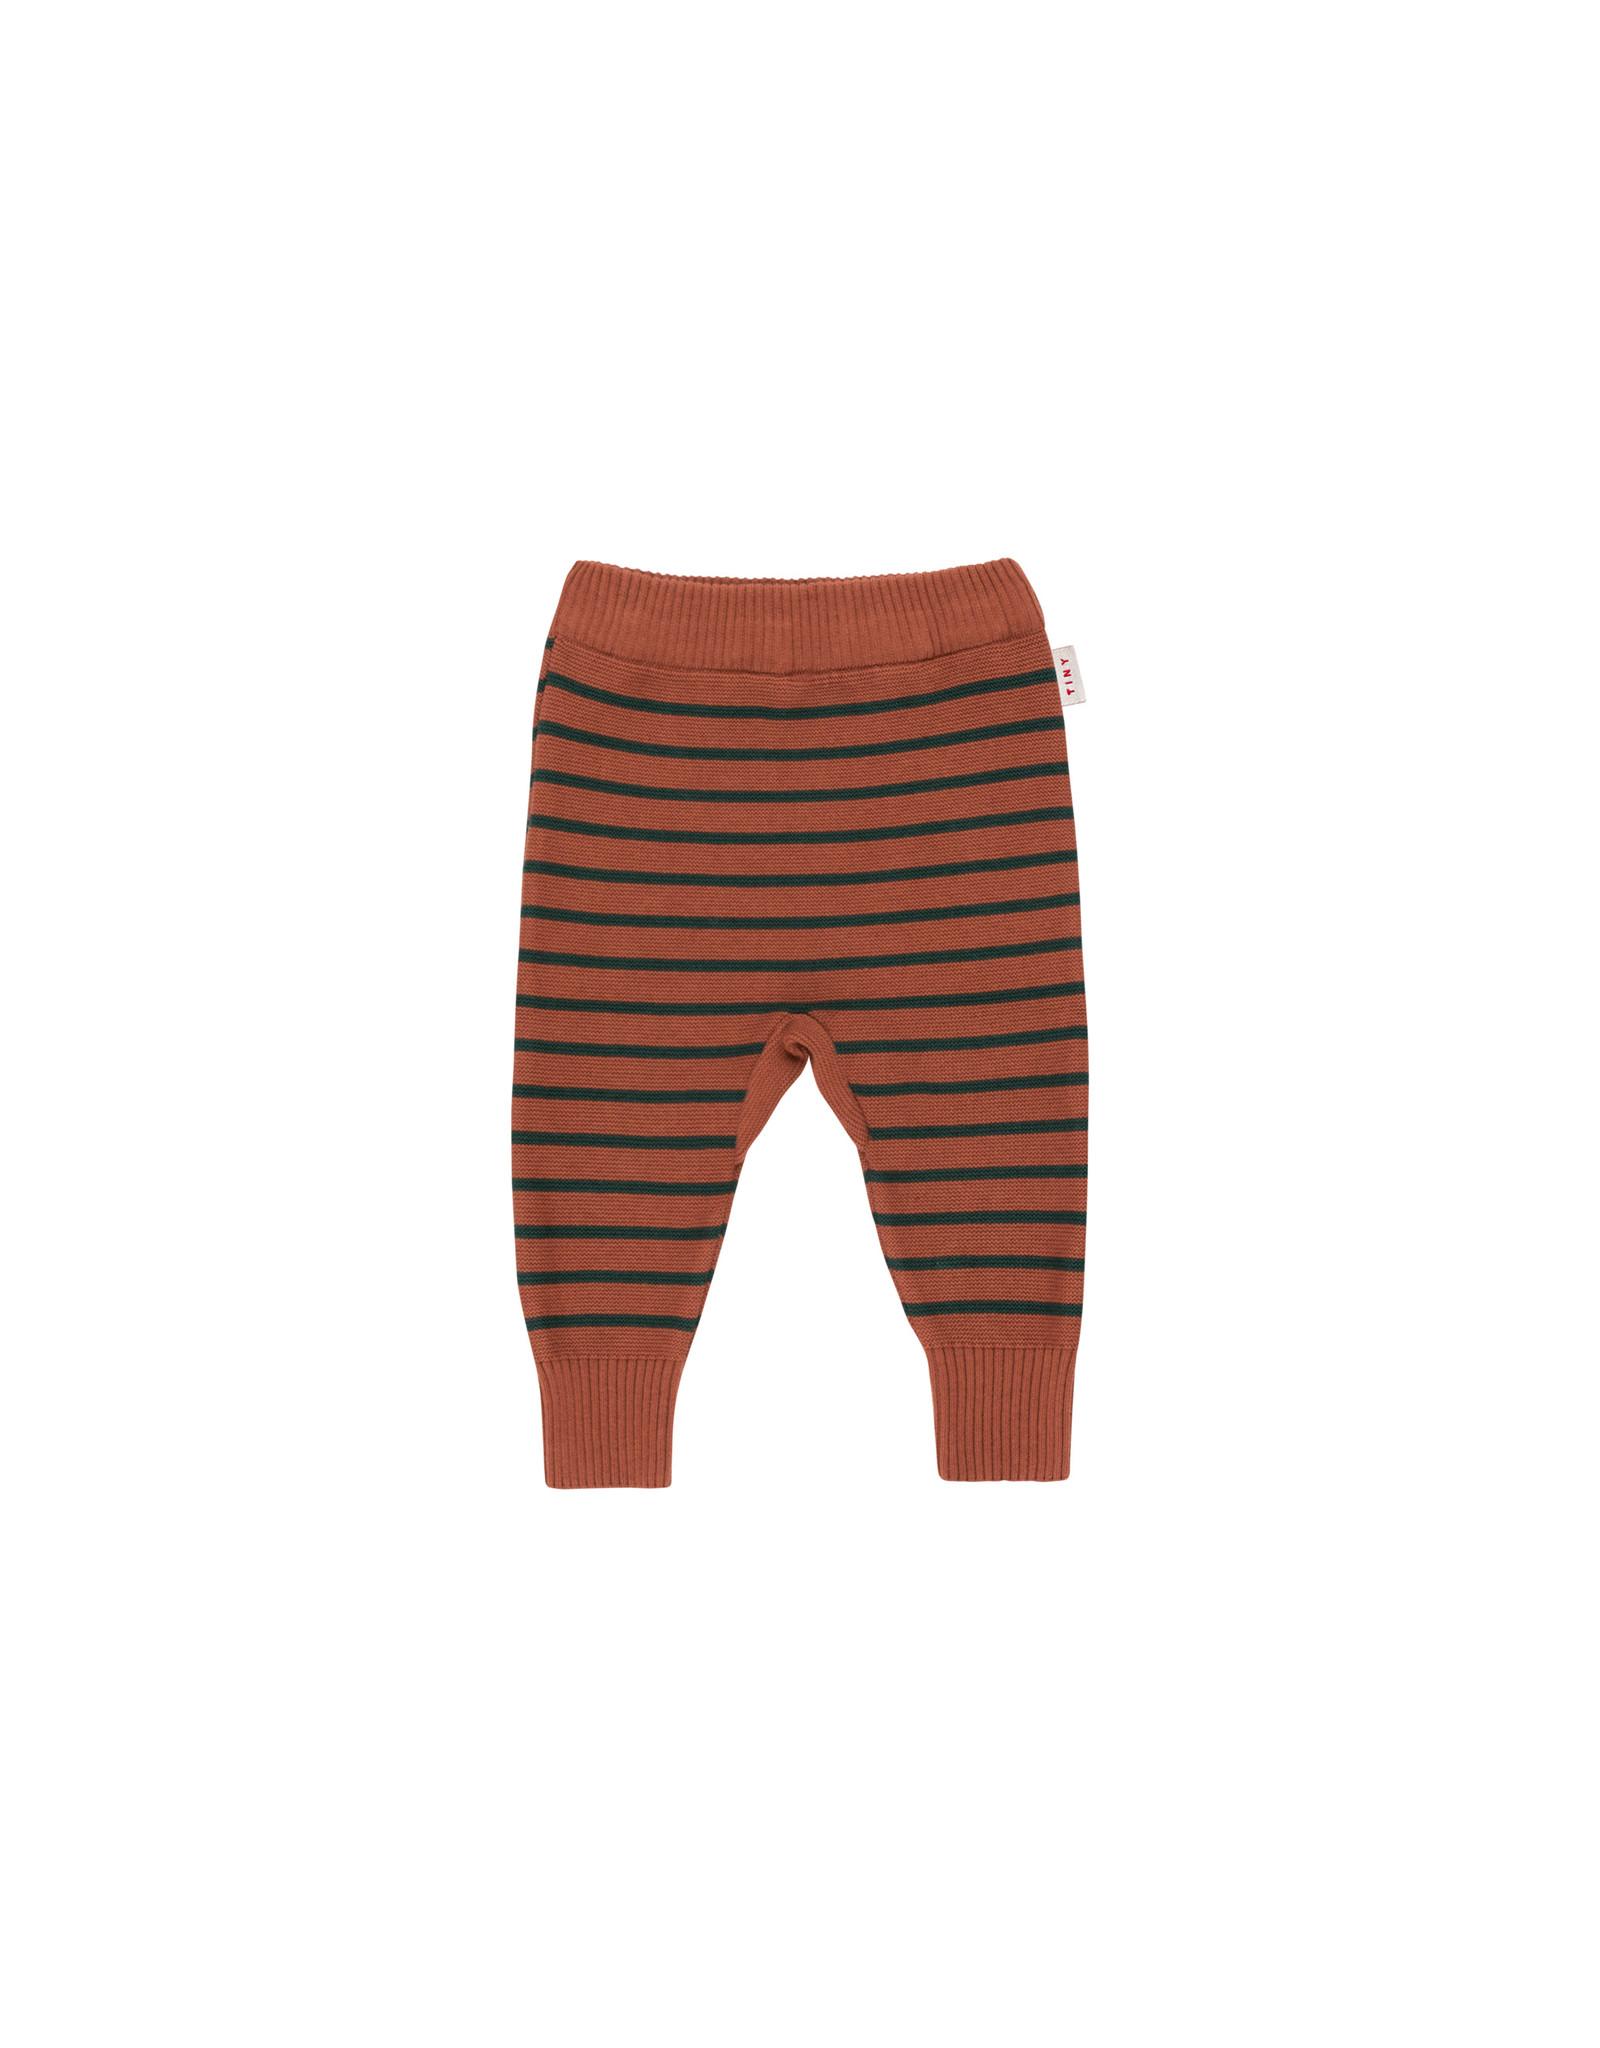 Small stripes pant